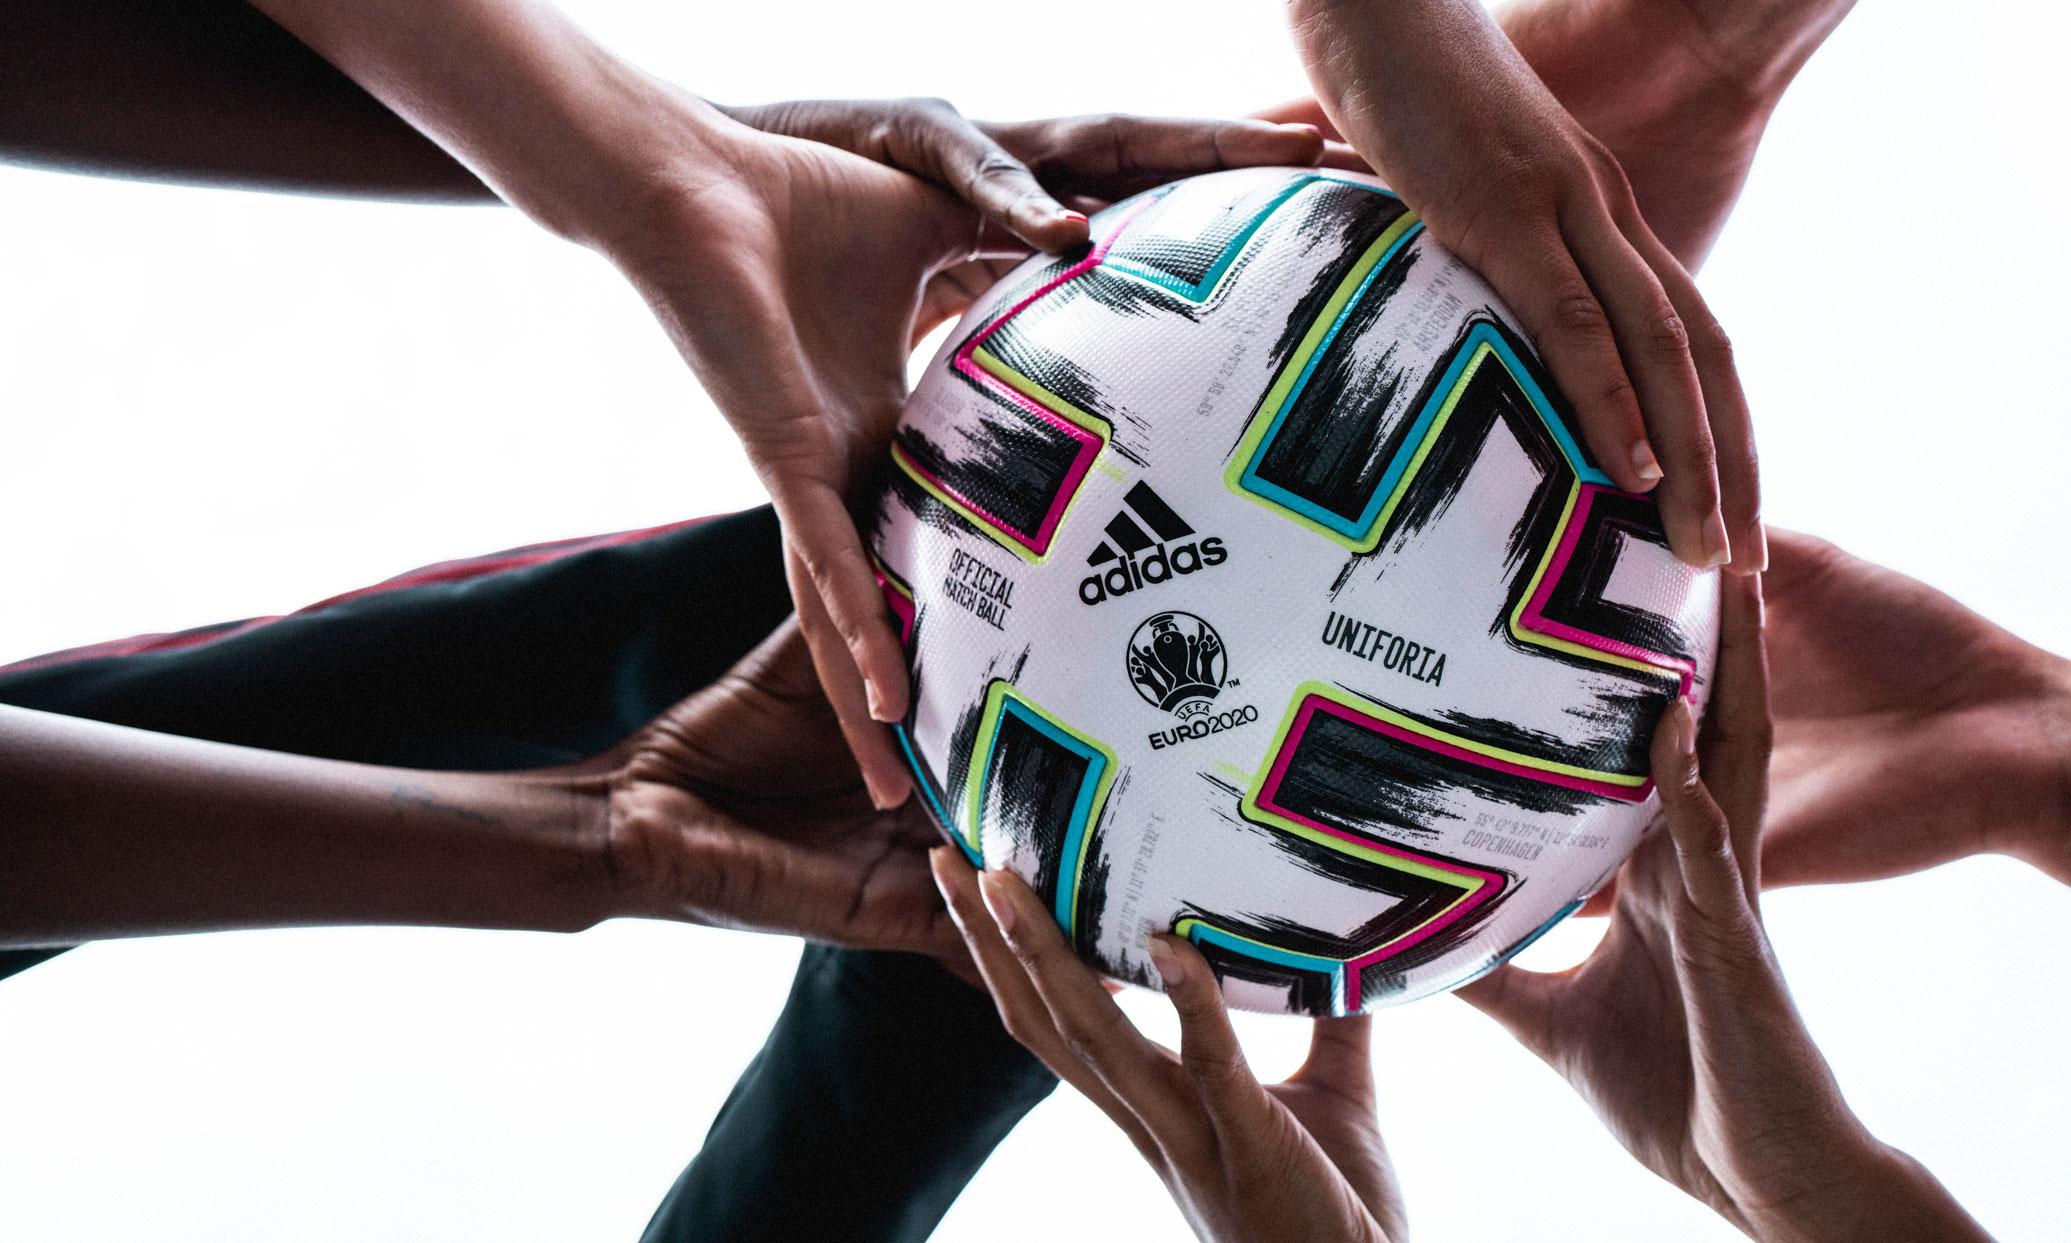 adidas 发布 2020 欧洲杯官方比赛用球 Uniforia